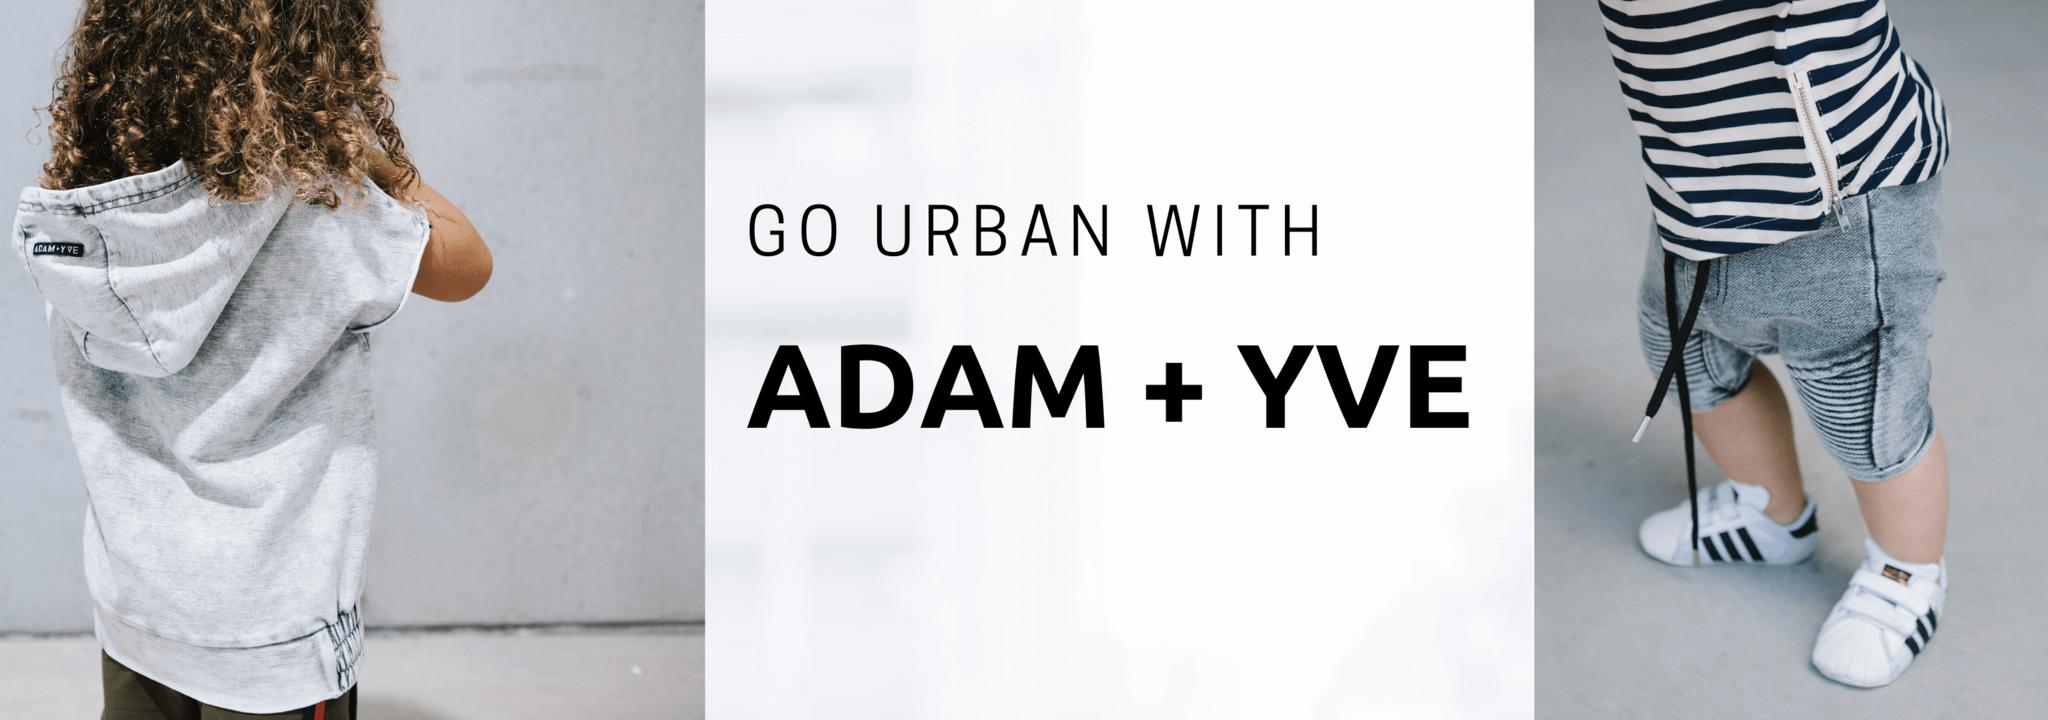 adam + yve nieuwe collectie stoere kinderkleding